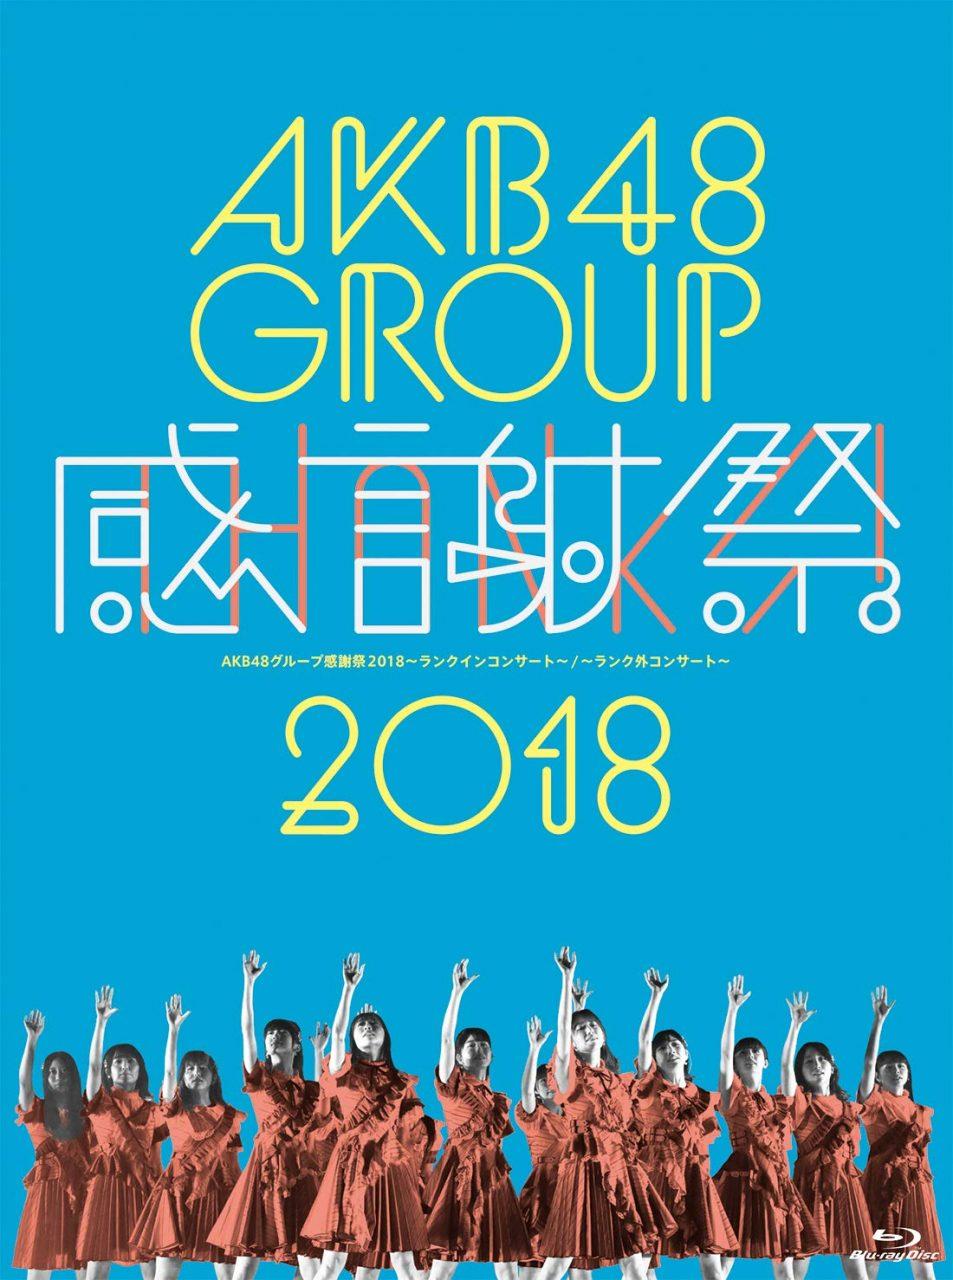 AKB48グループ感謝祭2018 〜ランクインコンサート/ランク外コンサート〜 [DVD][Blu-ray]